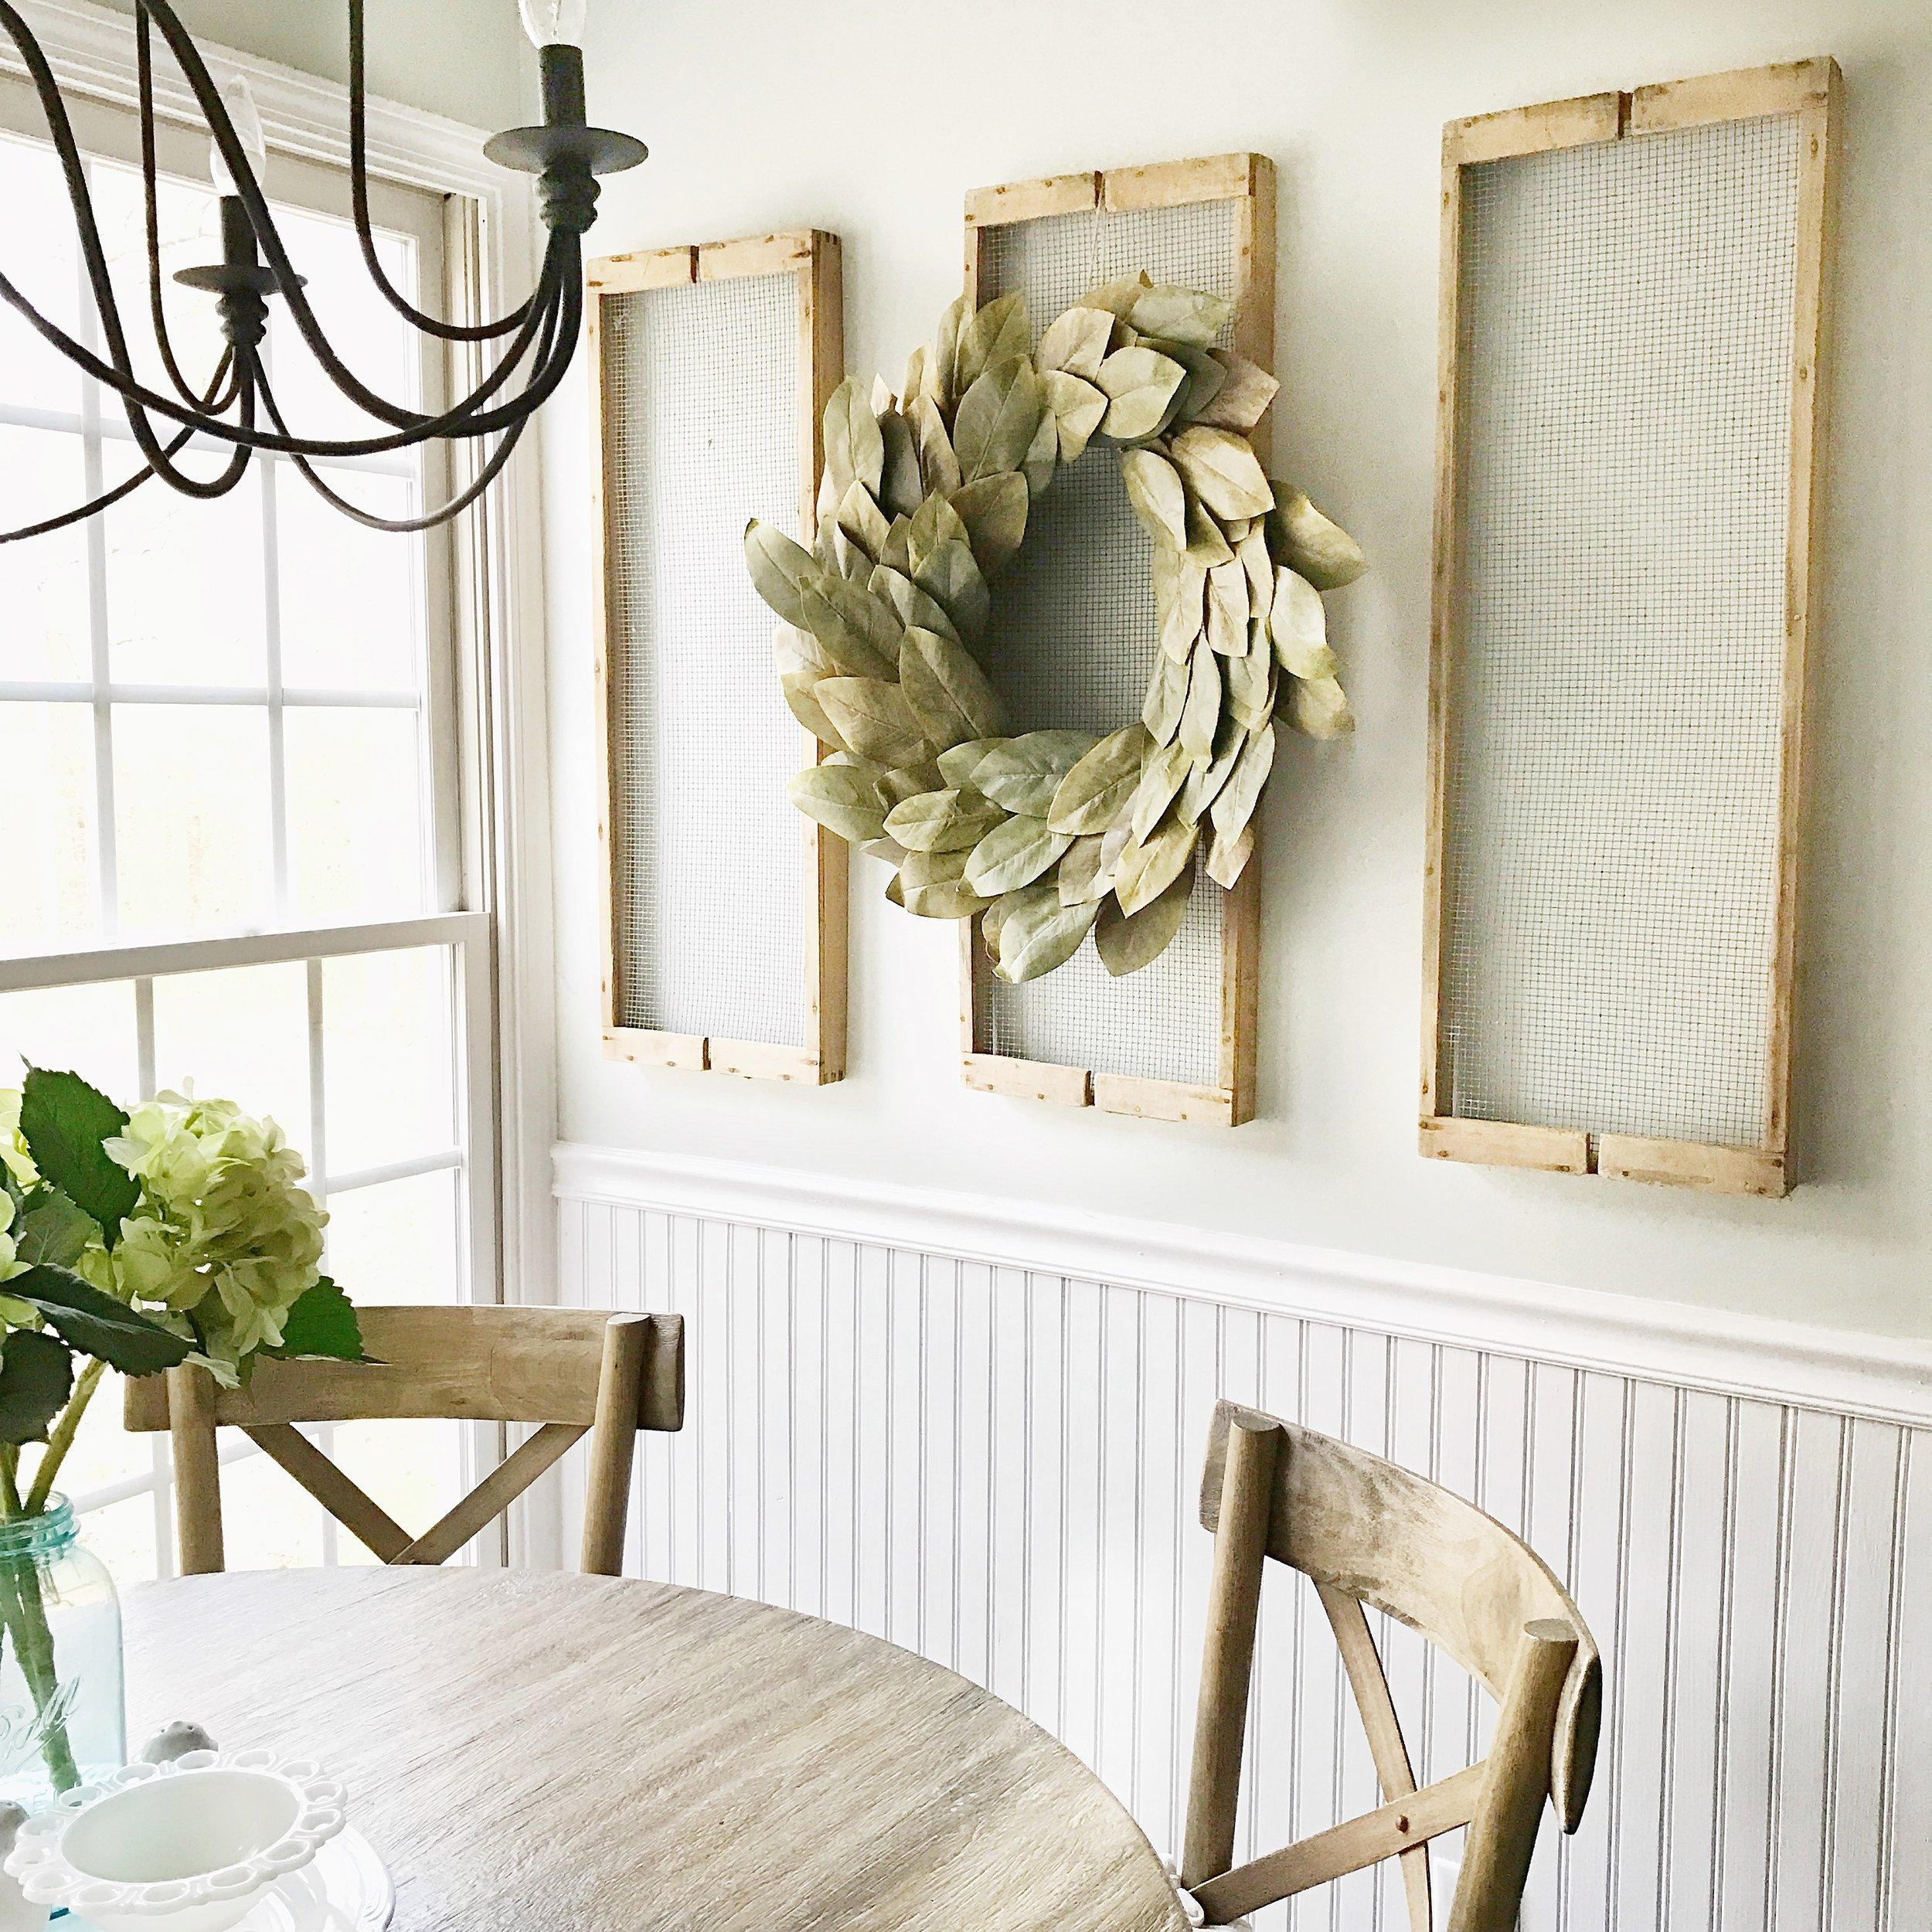 Antique Drying Rack Wall Decor- Plum Pretty Decor and Design